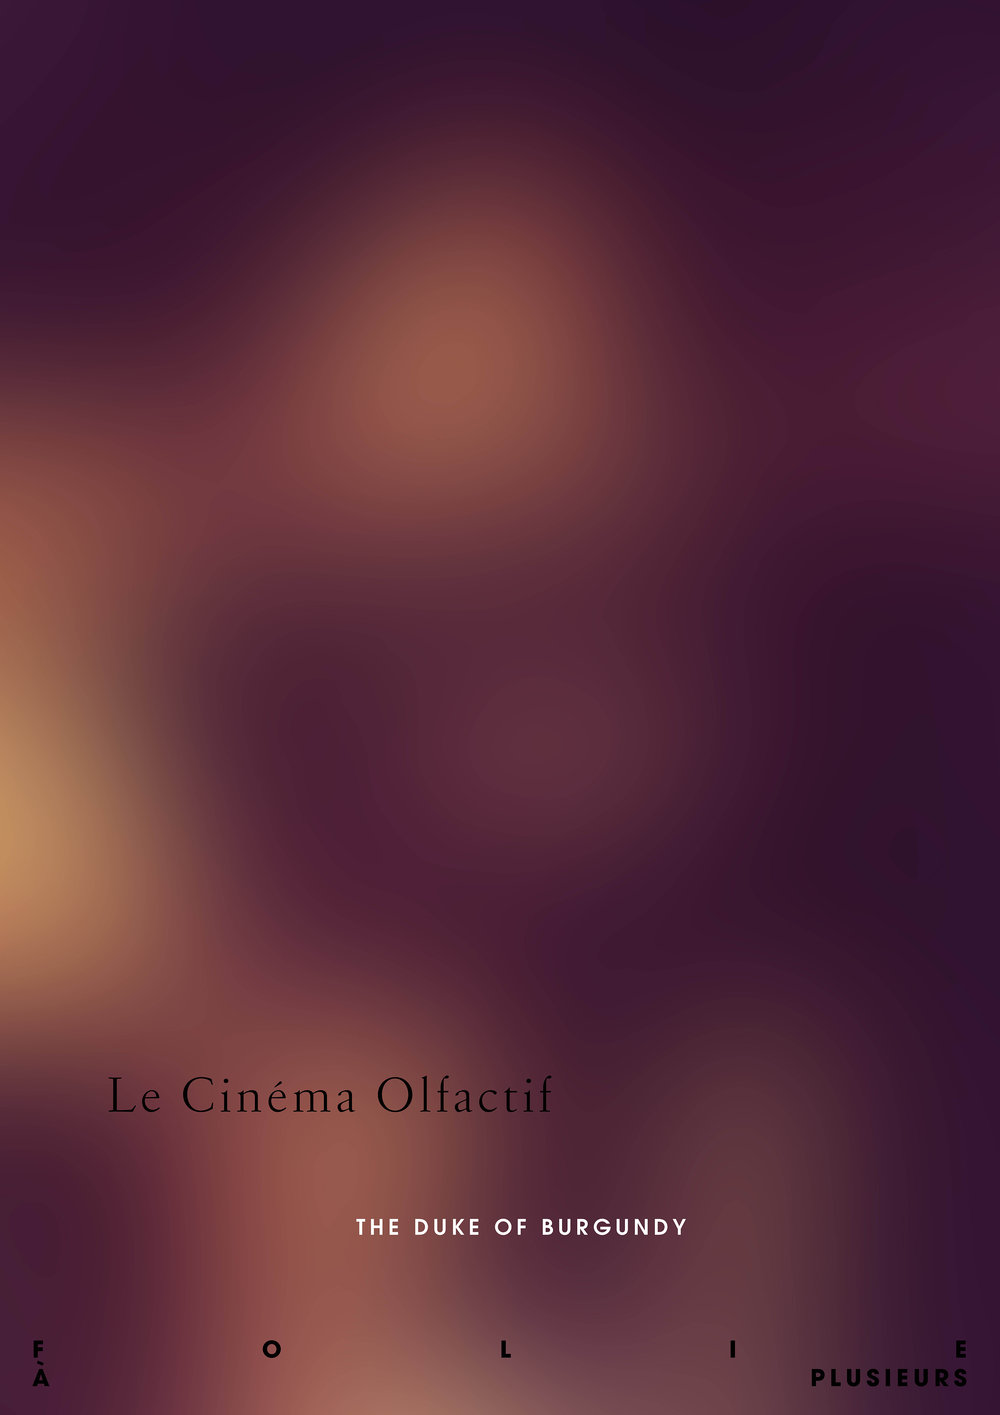 The_Duke_Of_Burgundy-Perfume-Folie-A-Plusieurs